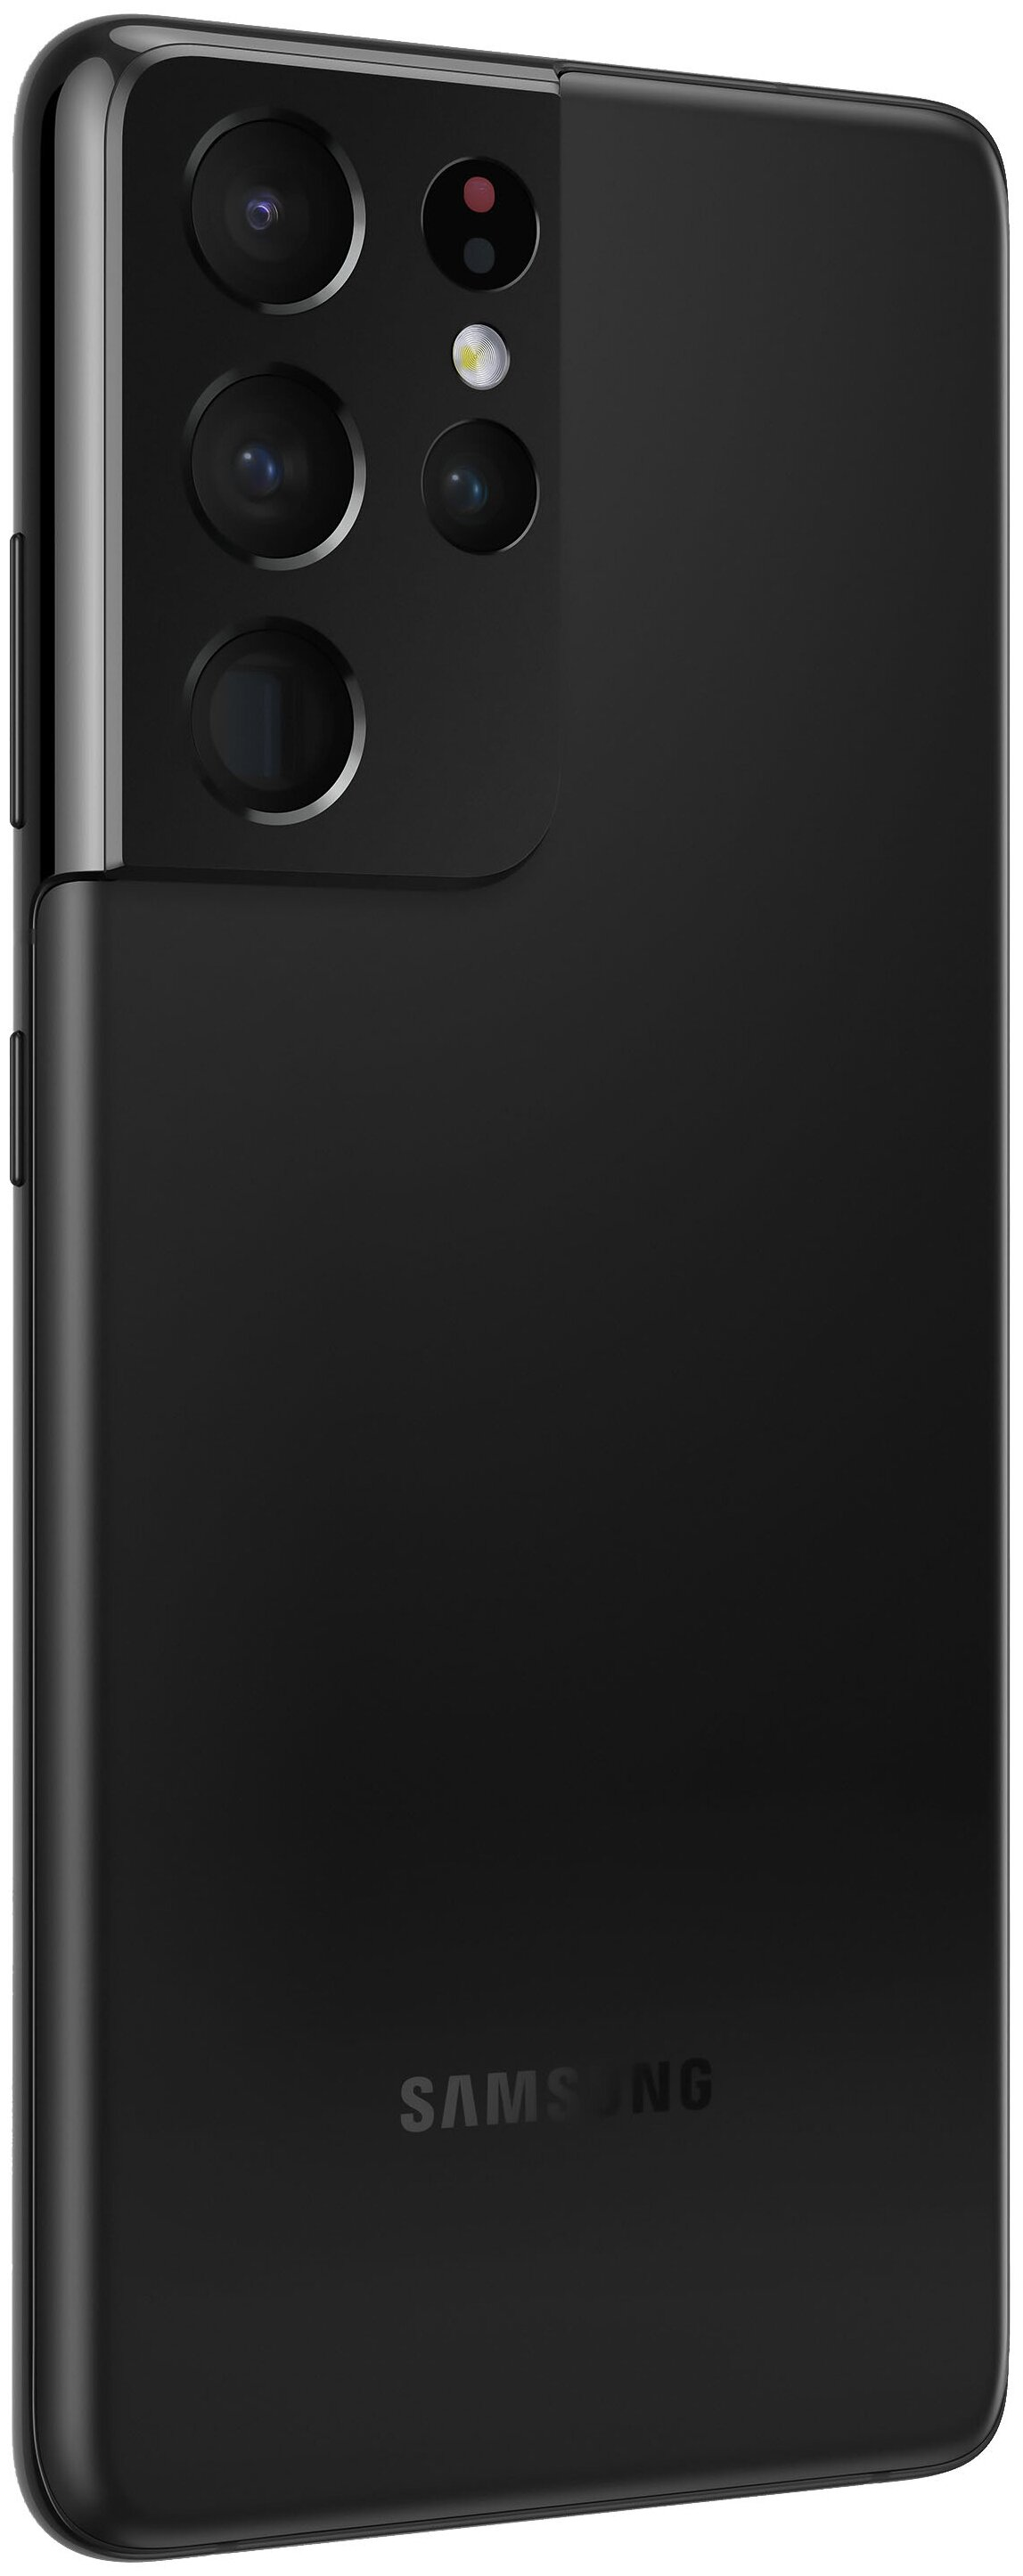 Samsung Galaxy S21 Ultra 5G 12/128GB - аккумулятор: 5000мА·ч